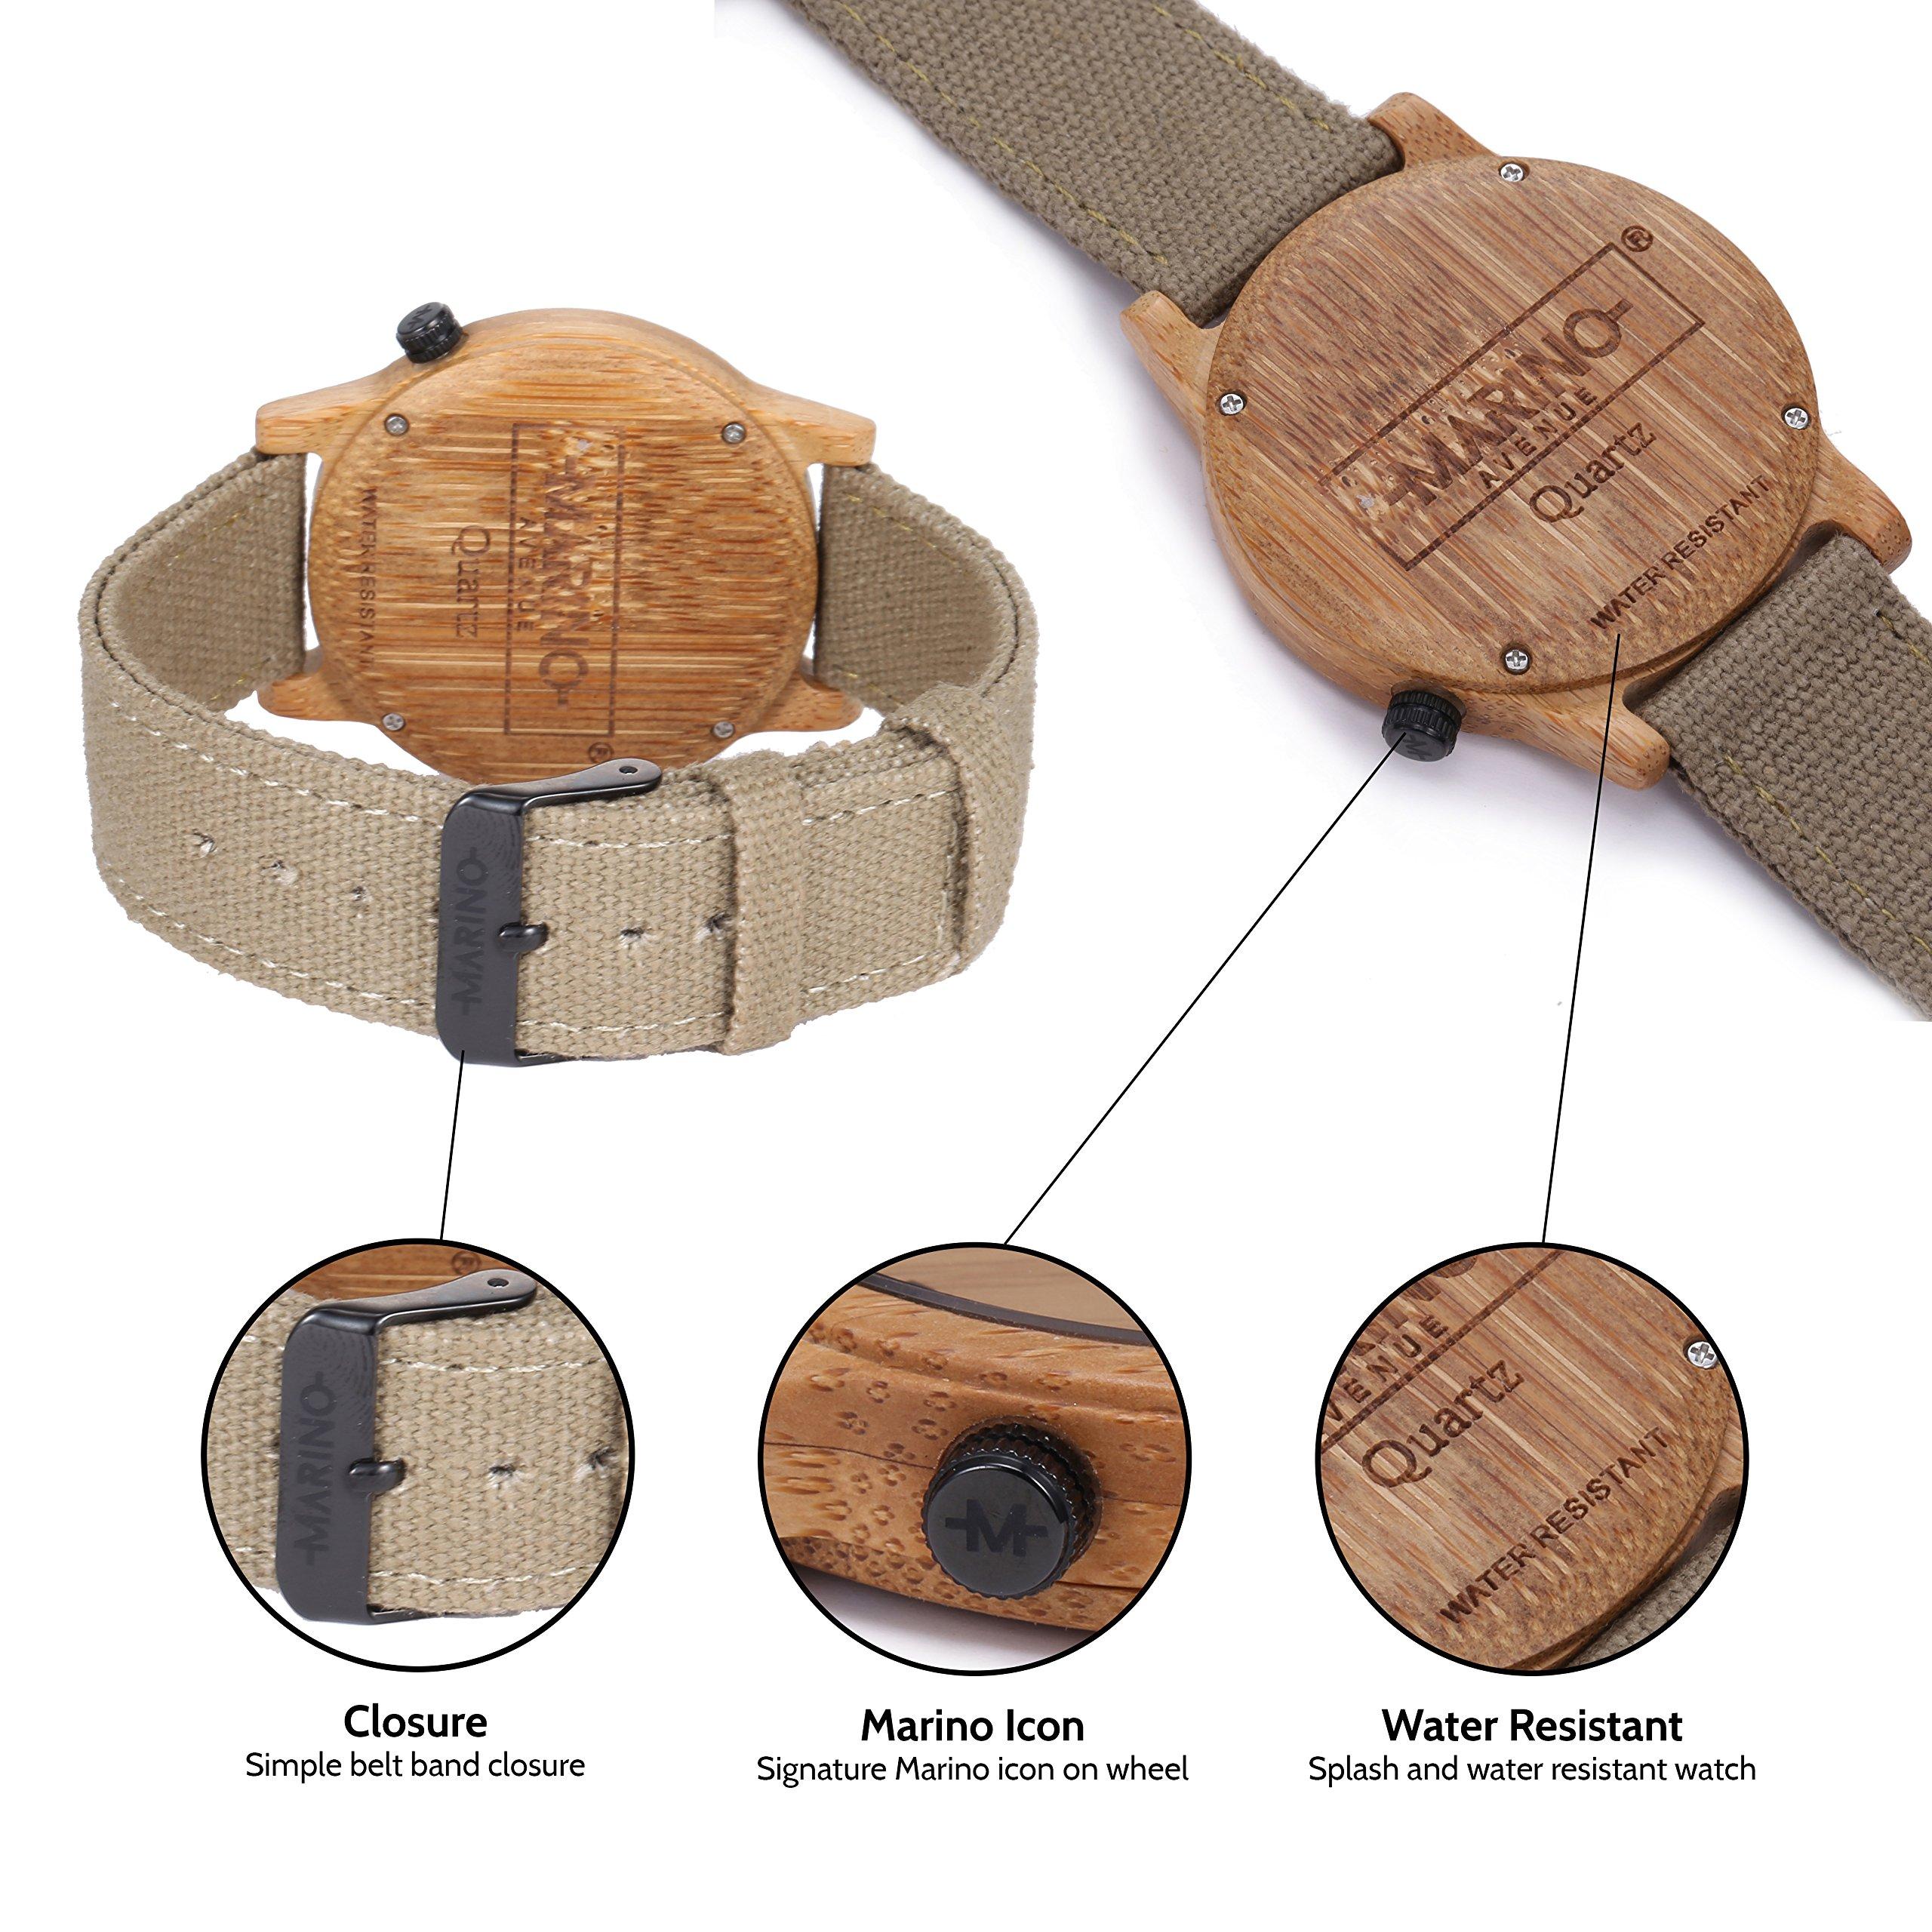 Marino Mens Wooden Watch - Wrist watches for Men - Dress Wood Watch (One Size, Khaki - Canvas Band) by Marino Avenue (Image #4)